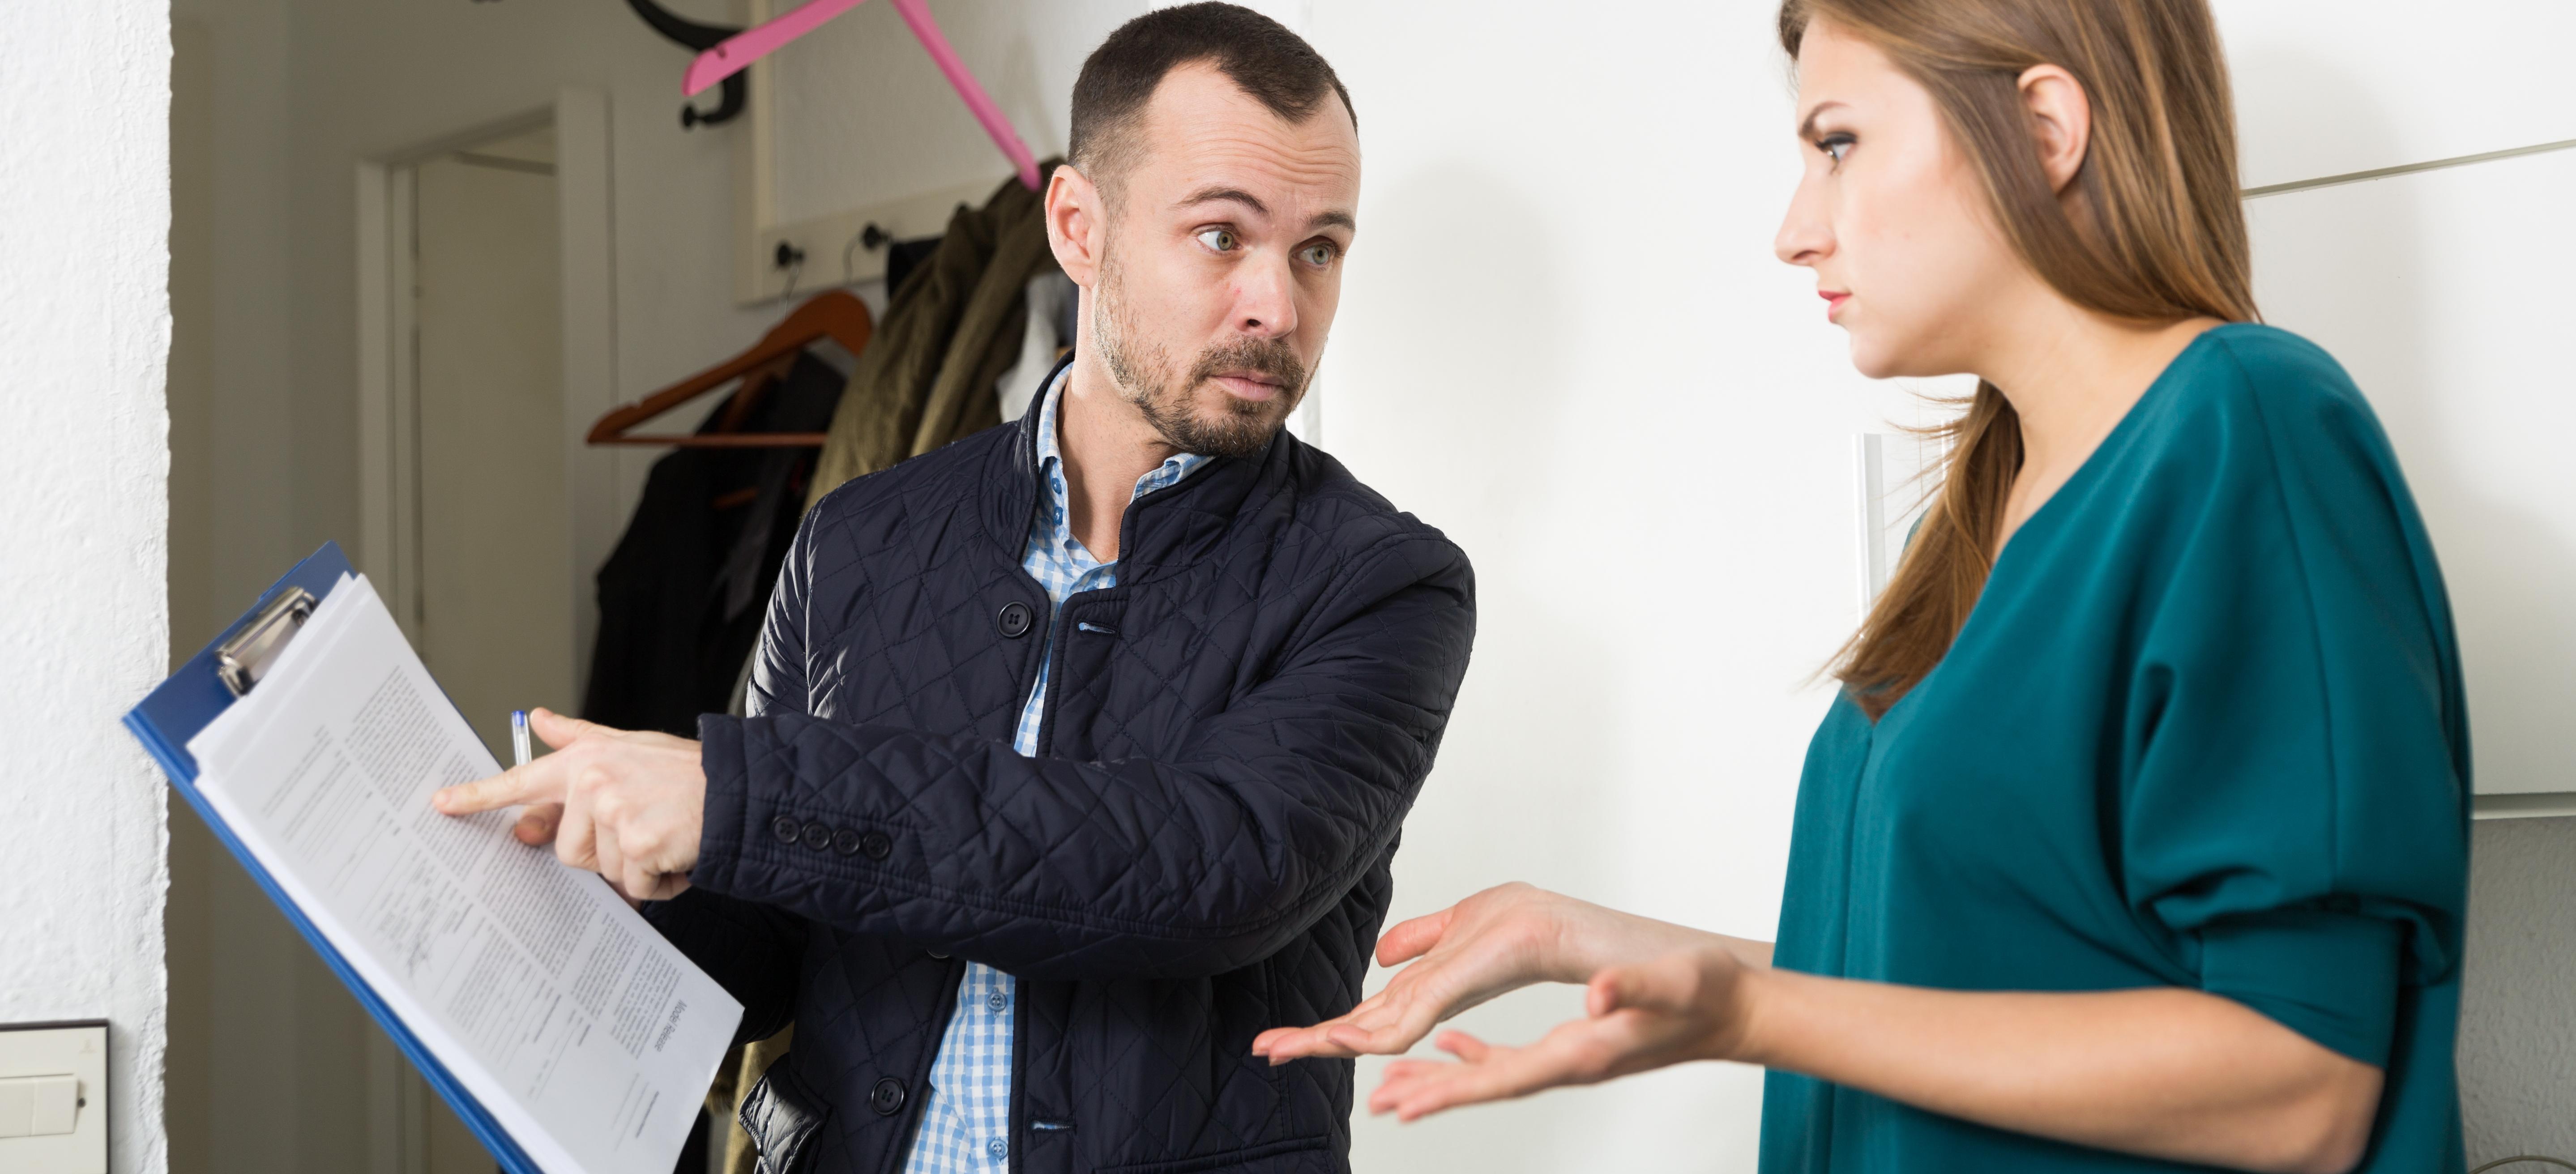 Ten Landlord Legal Mistakes to Avoid - FindLaw